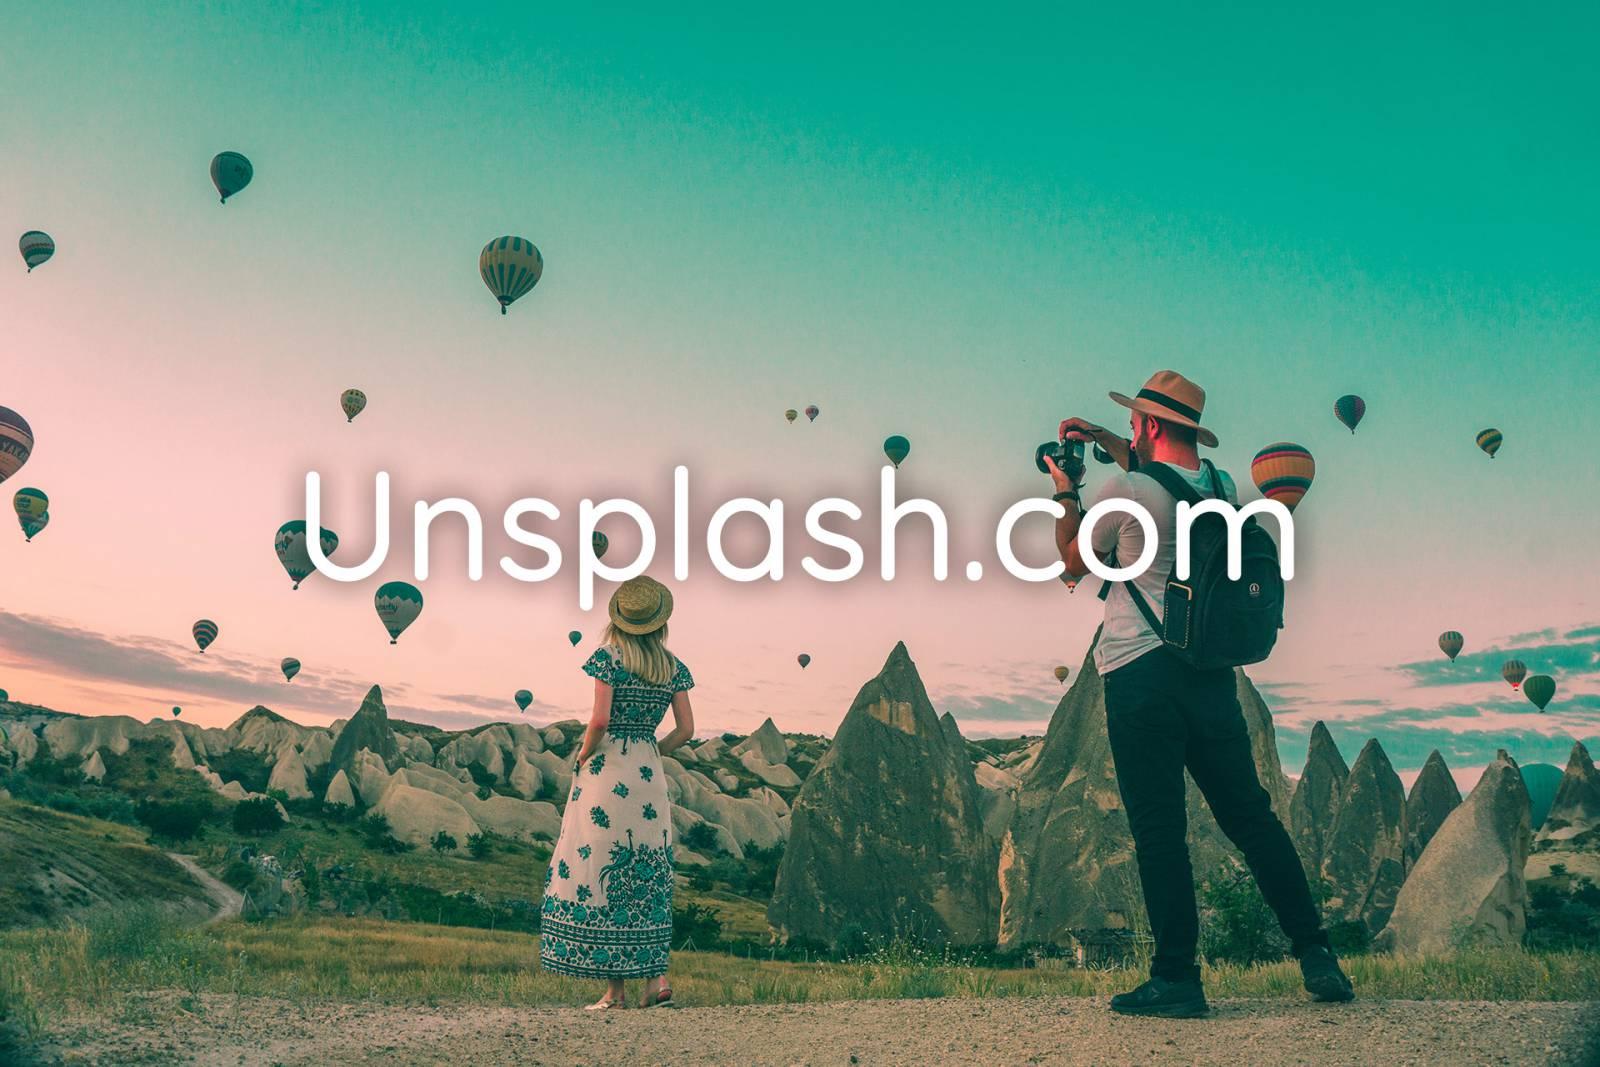 unsplash.com gratis stockfoto's